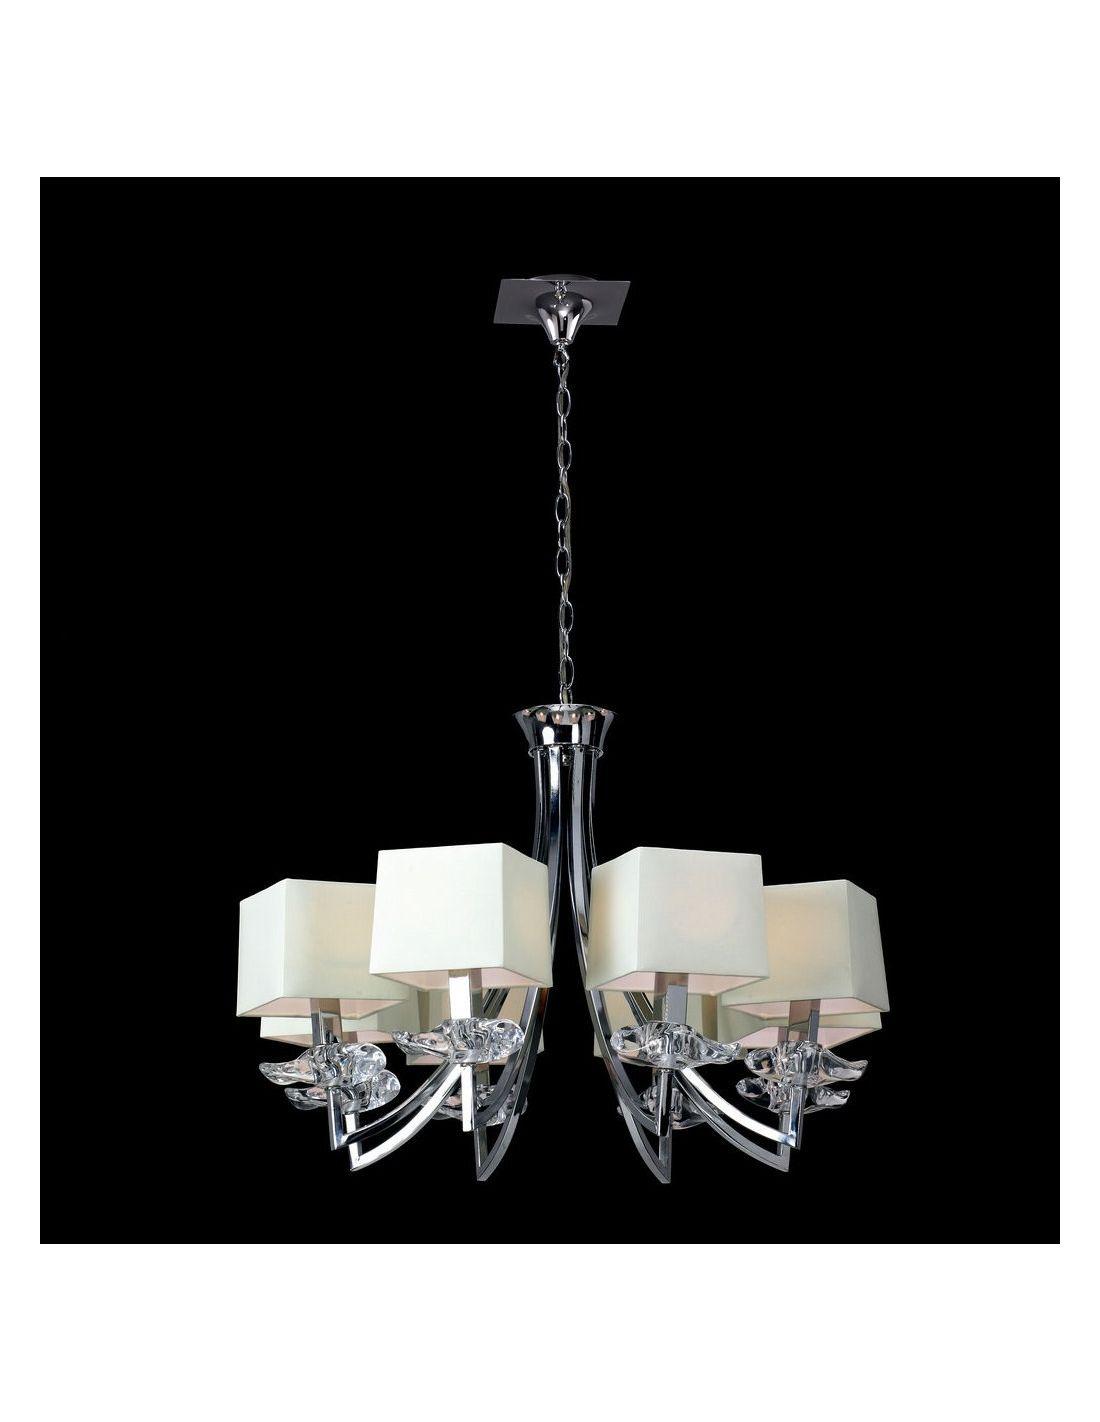 Lamparas lamparas modernas lamparas de techo modernas - Lamparas de techo baratas carrefour ...